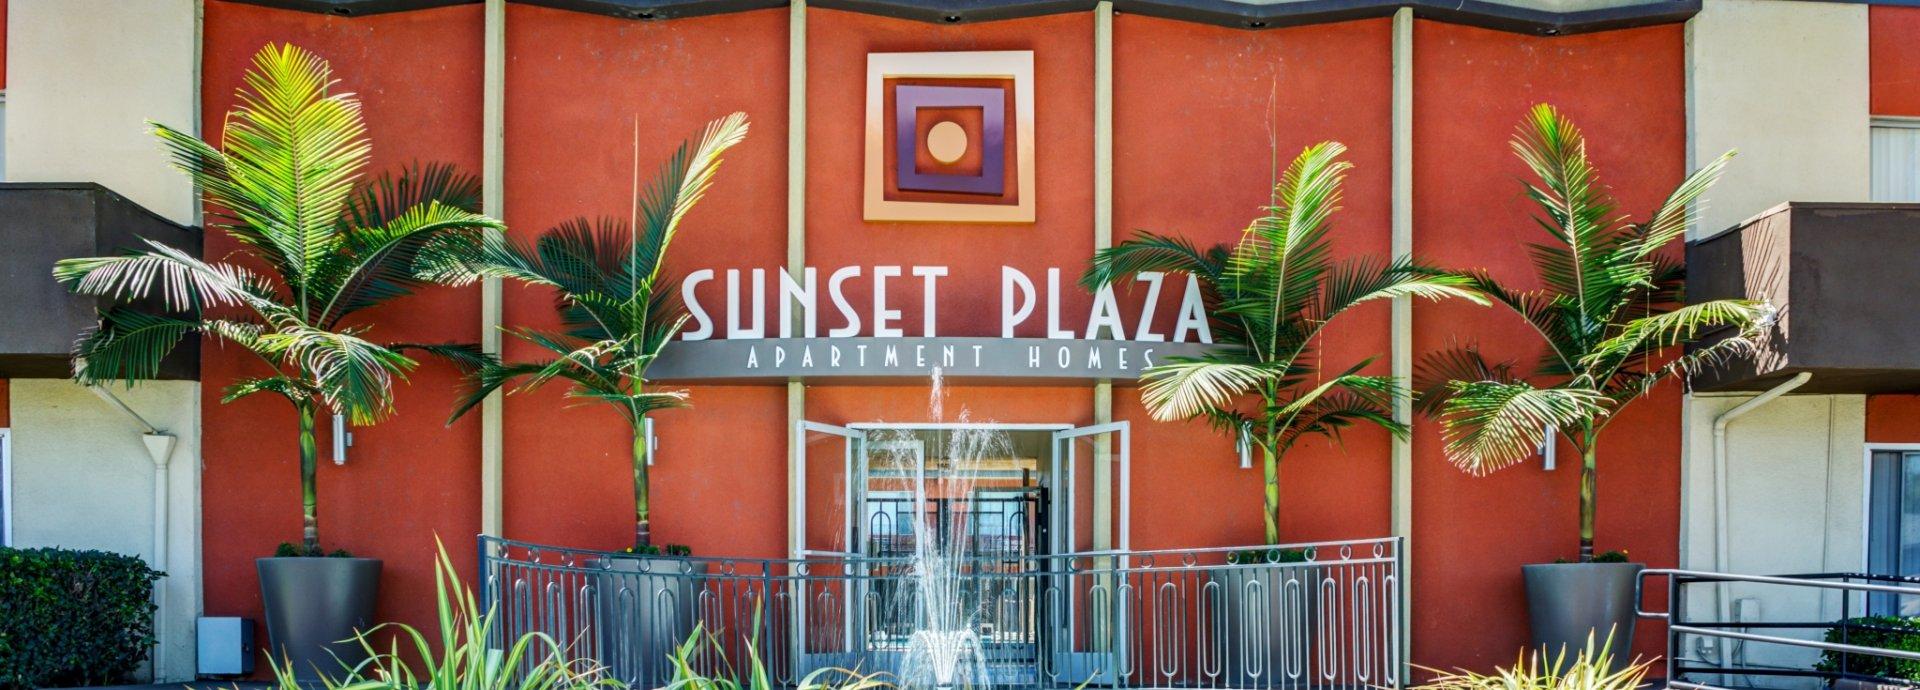 Sunset Plaza Apartment Homes